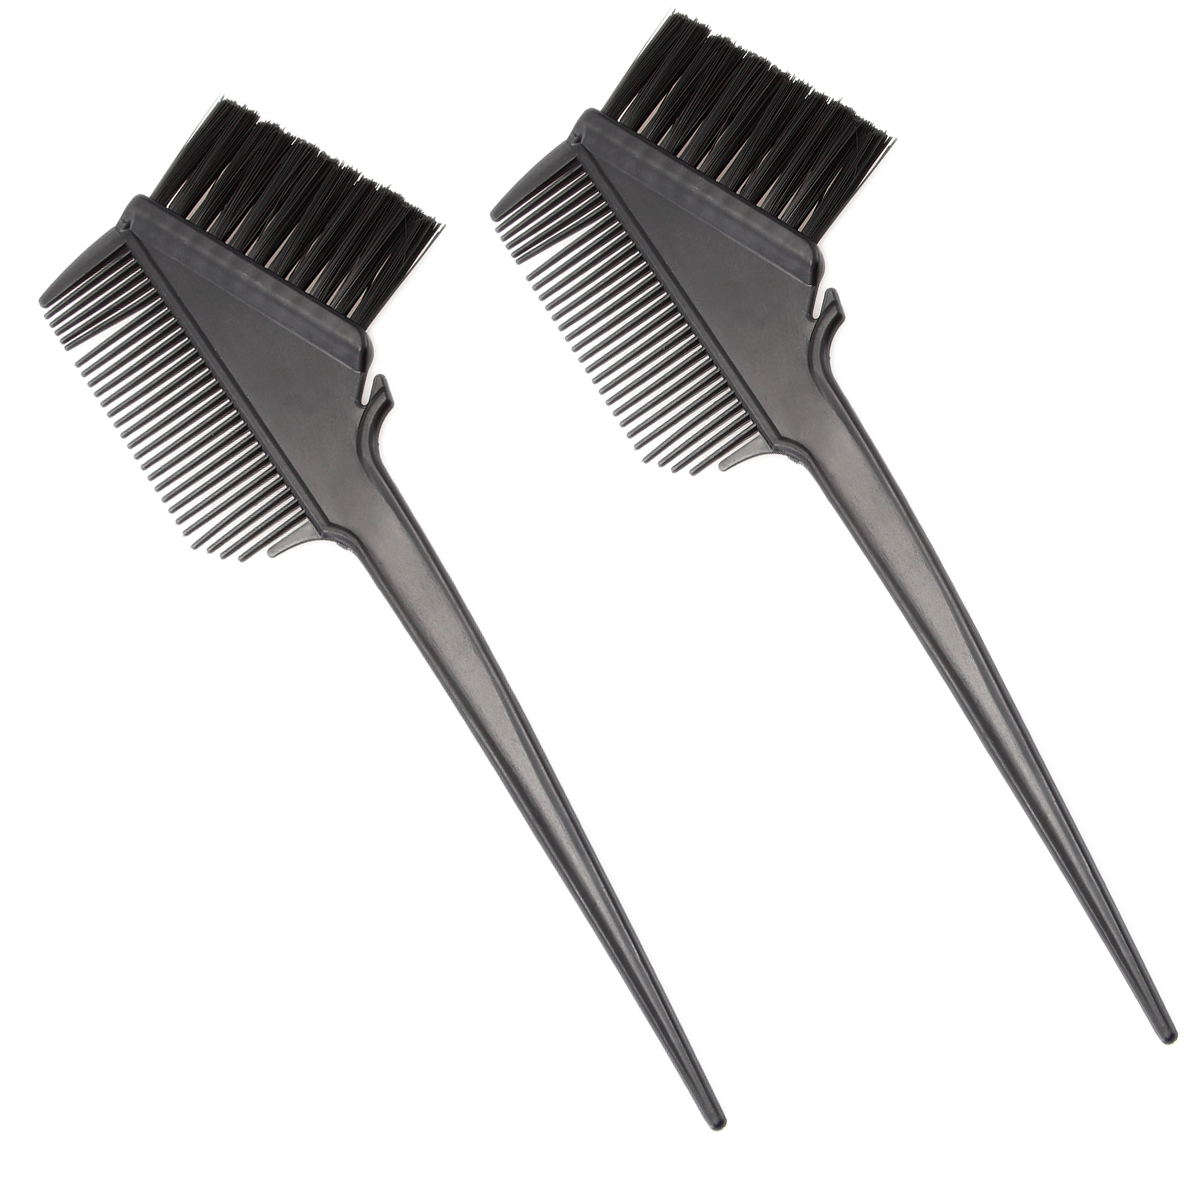 Hair Dye Coloring Brush Comb Barber Salon Tint Hairdressing ...